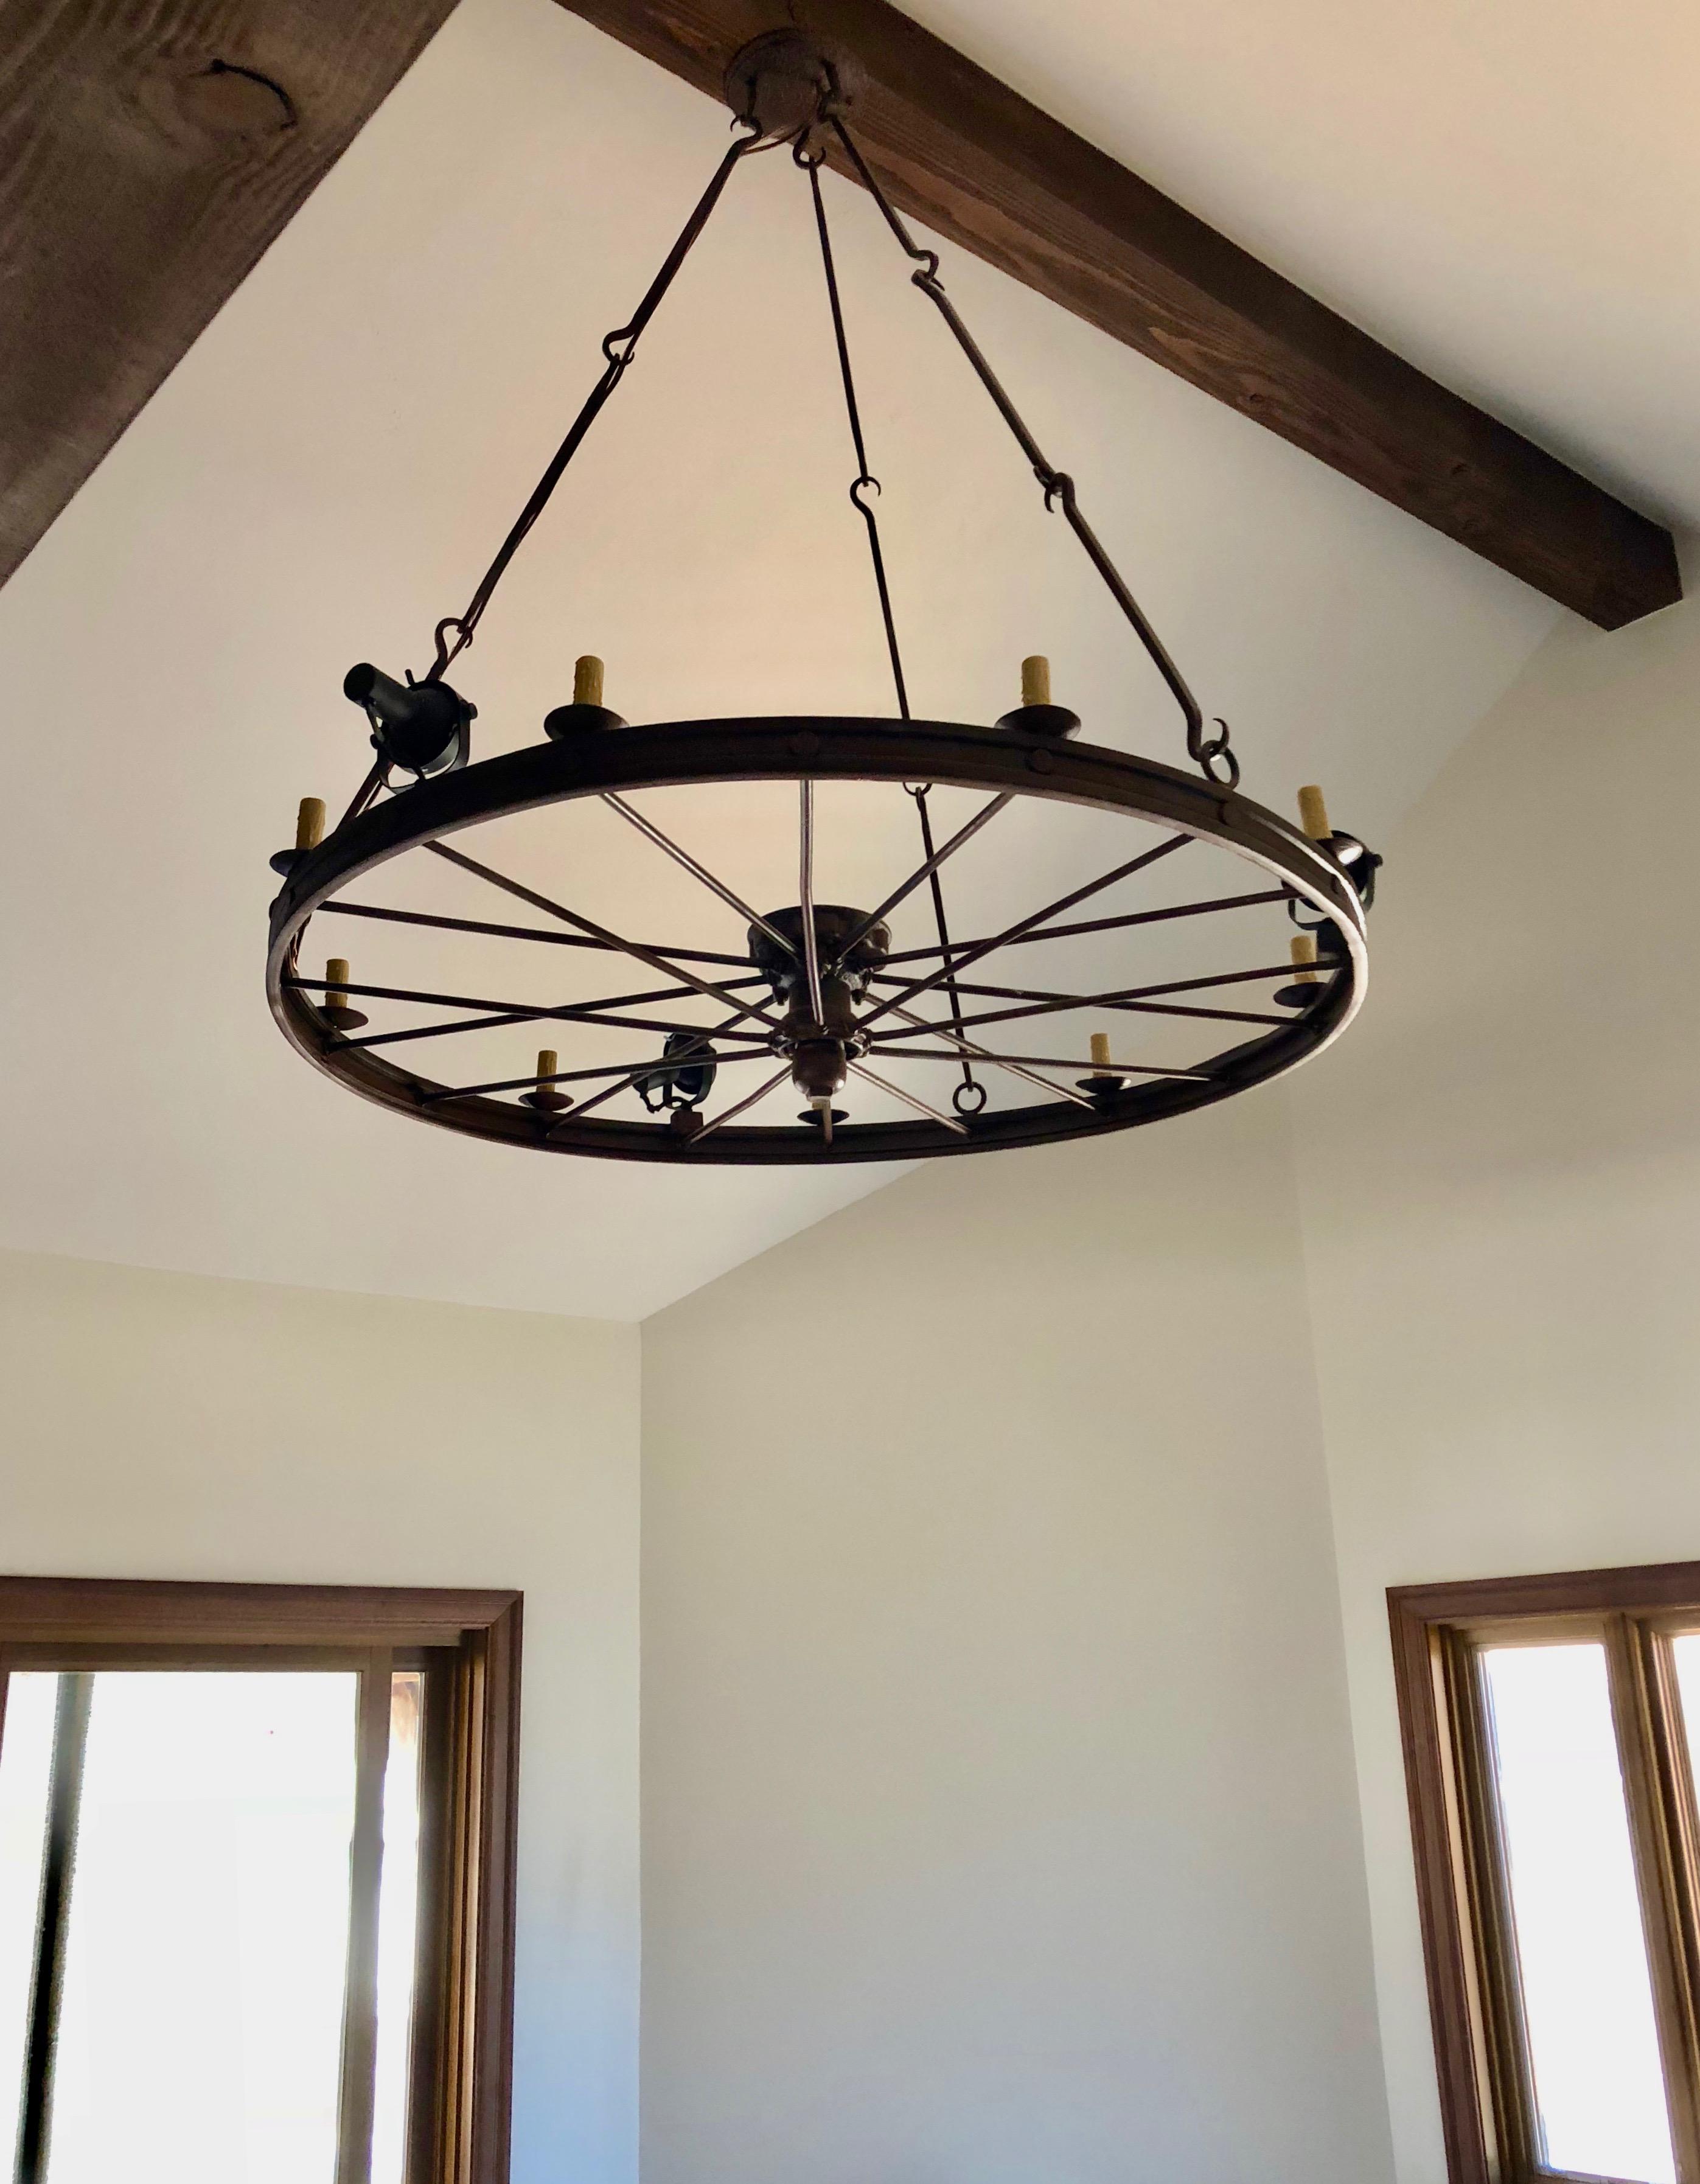 Lamps Plus Installation